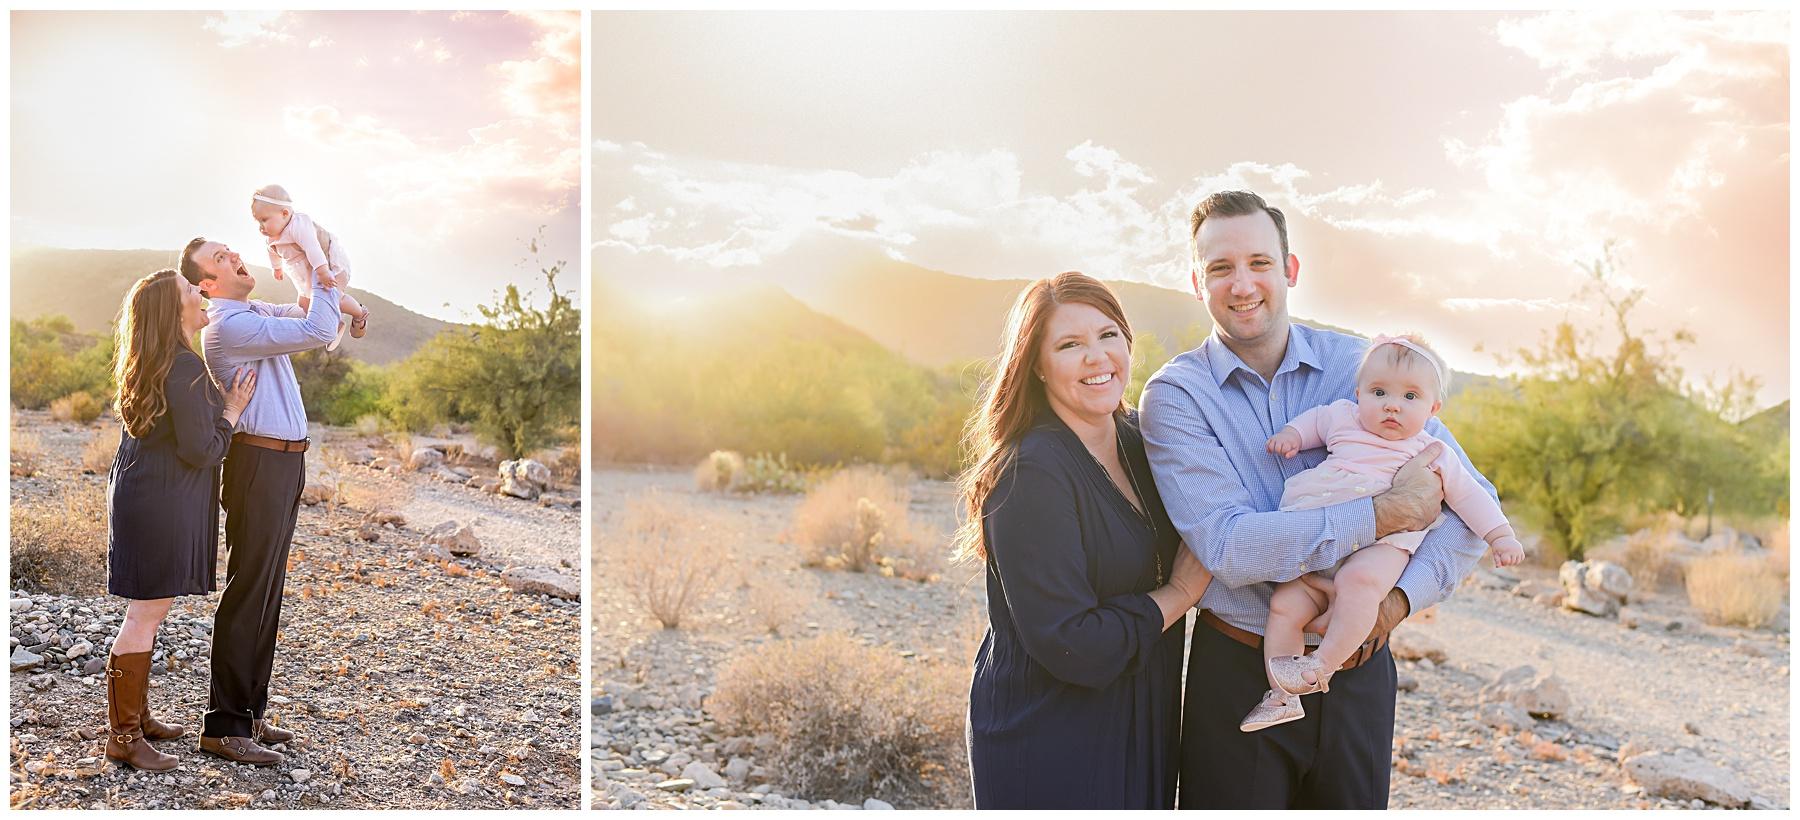 AZ Desert glow family | SweetLife Photography